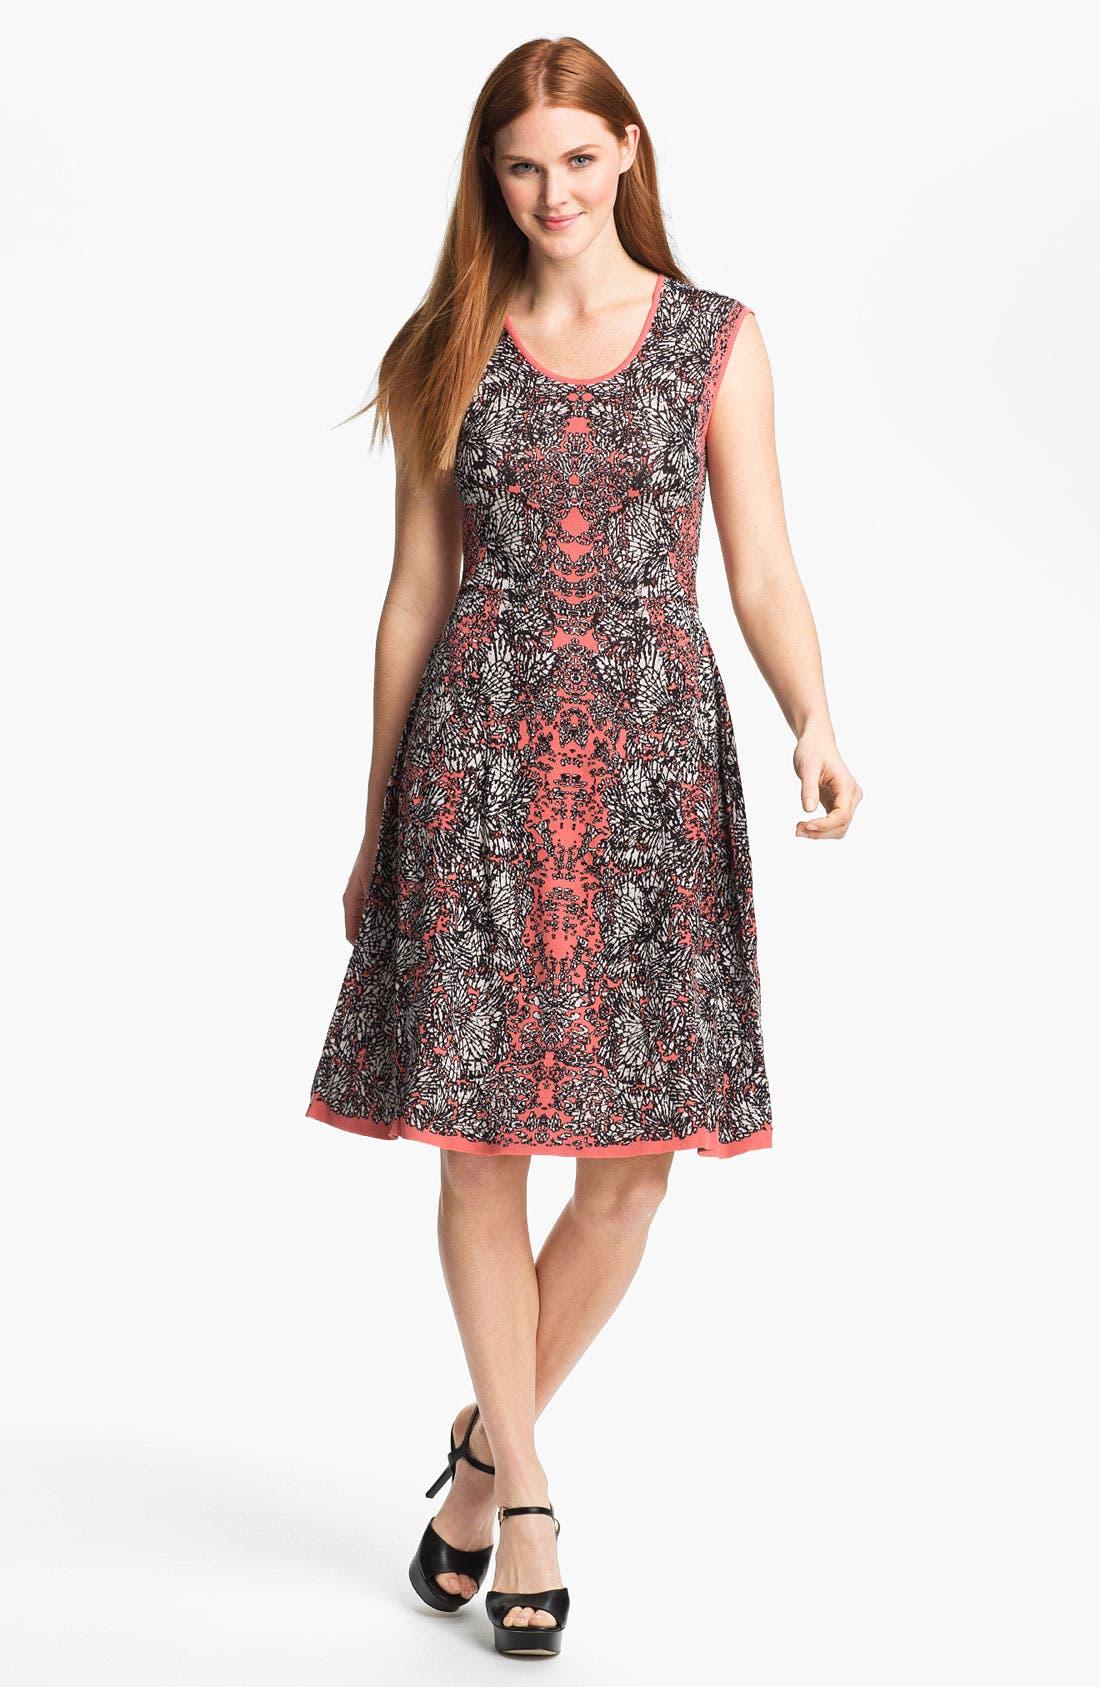 Main Image - Nic + Zoe 'Peeking Out' Print Dress